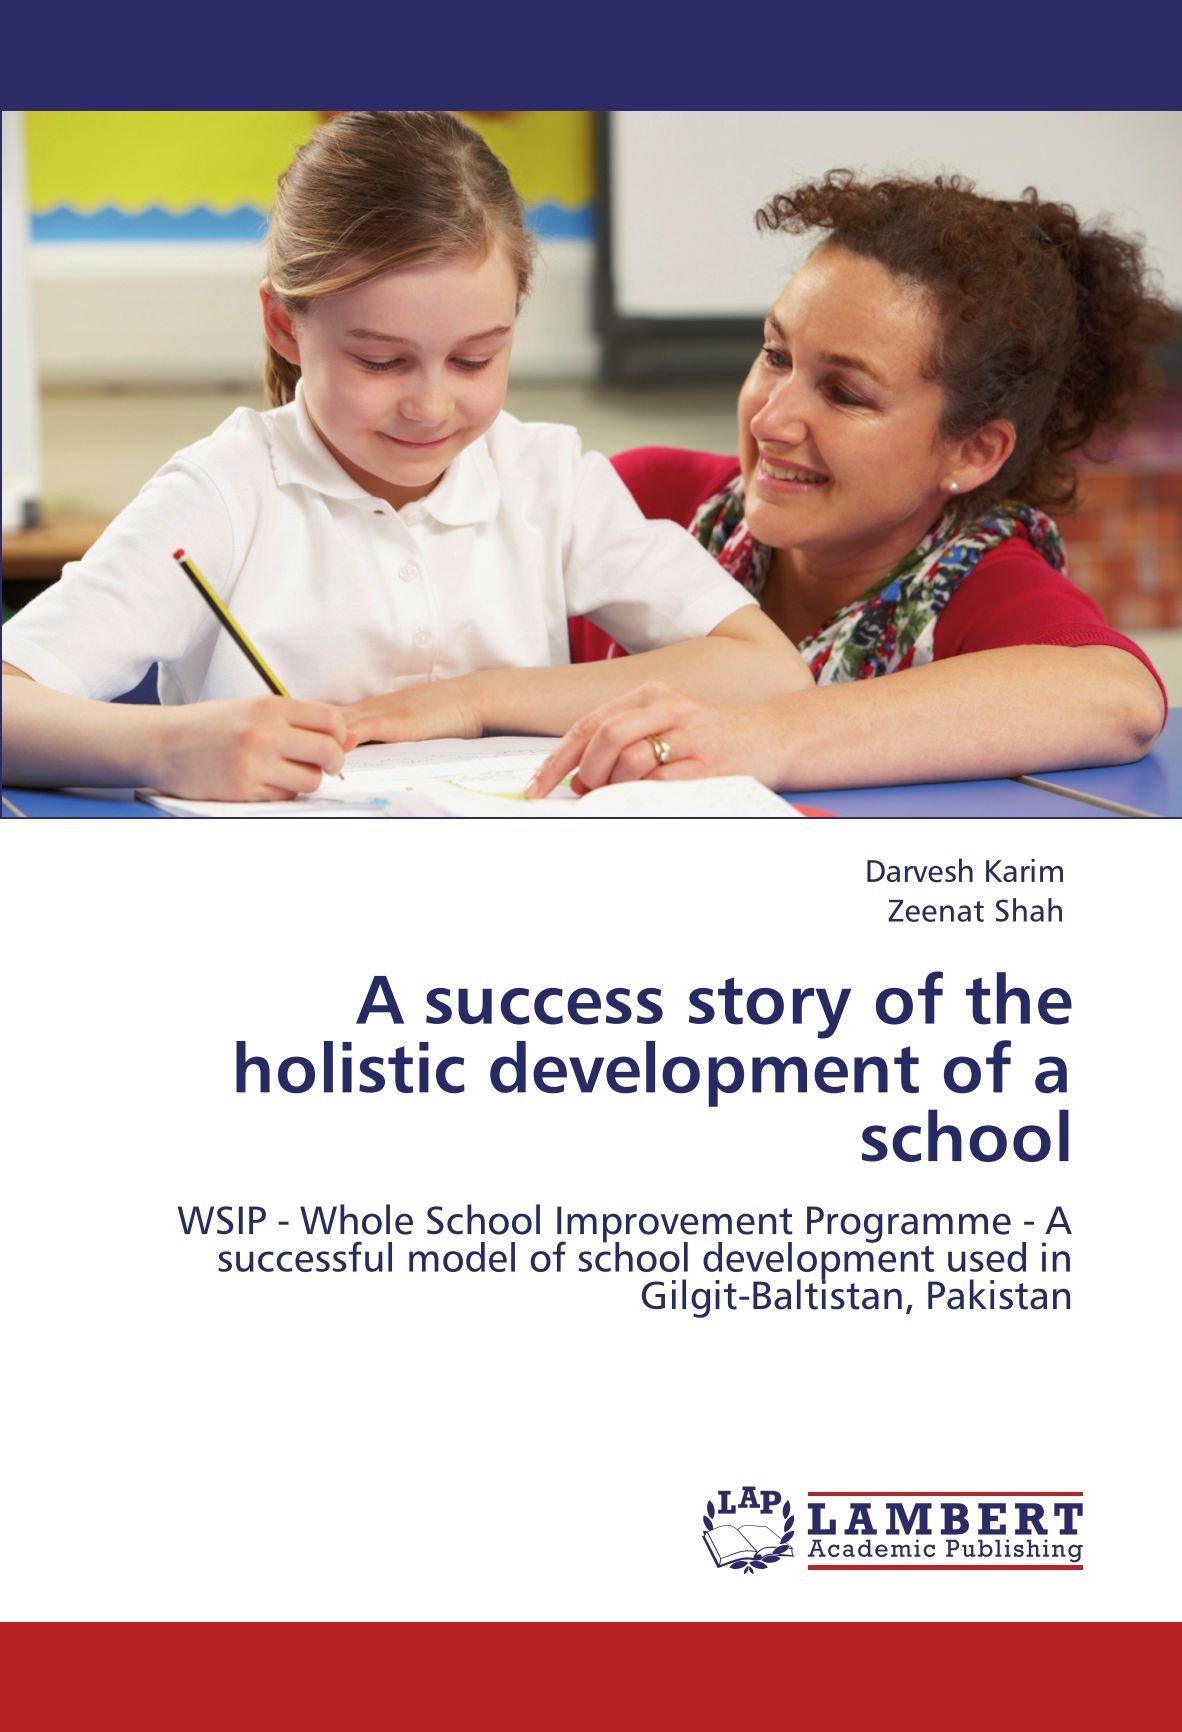 A success story of the holistic development of a school: WSIP - Whole School Improvement Programme - A successful model of school development used in Gilgit-Baltistan, Pakistan pdf